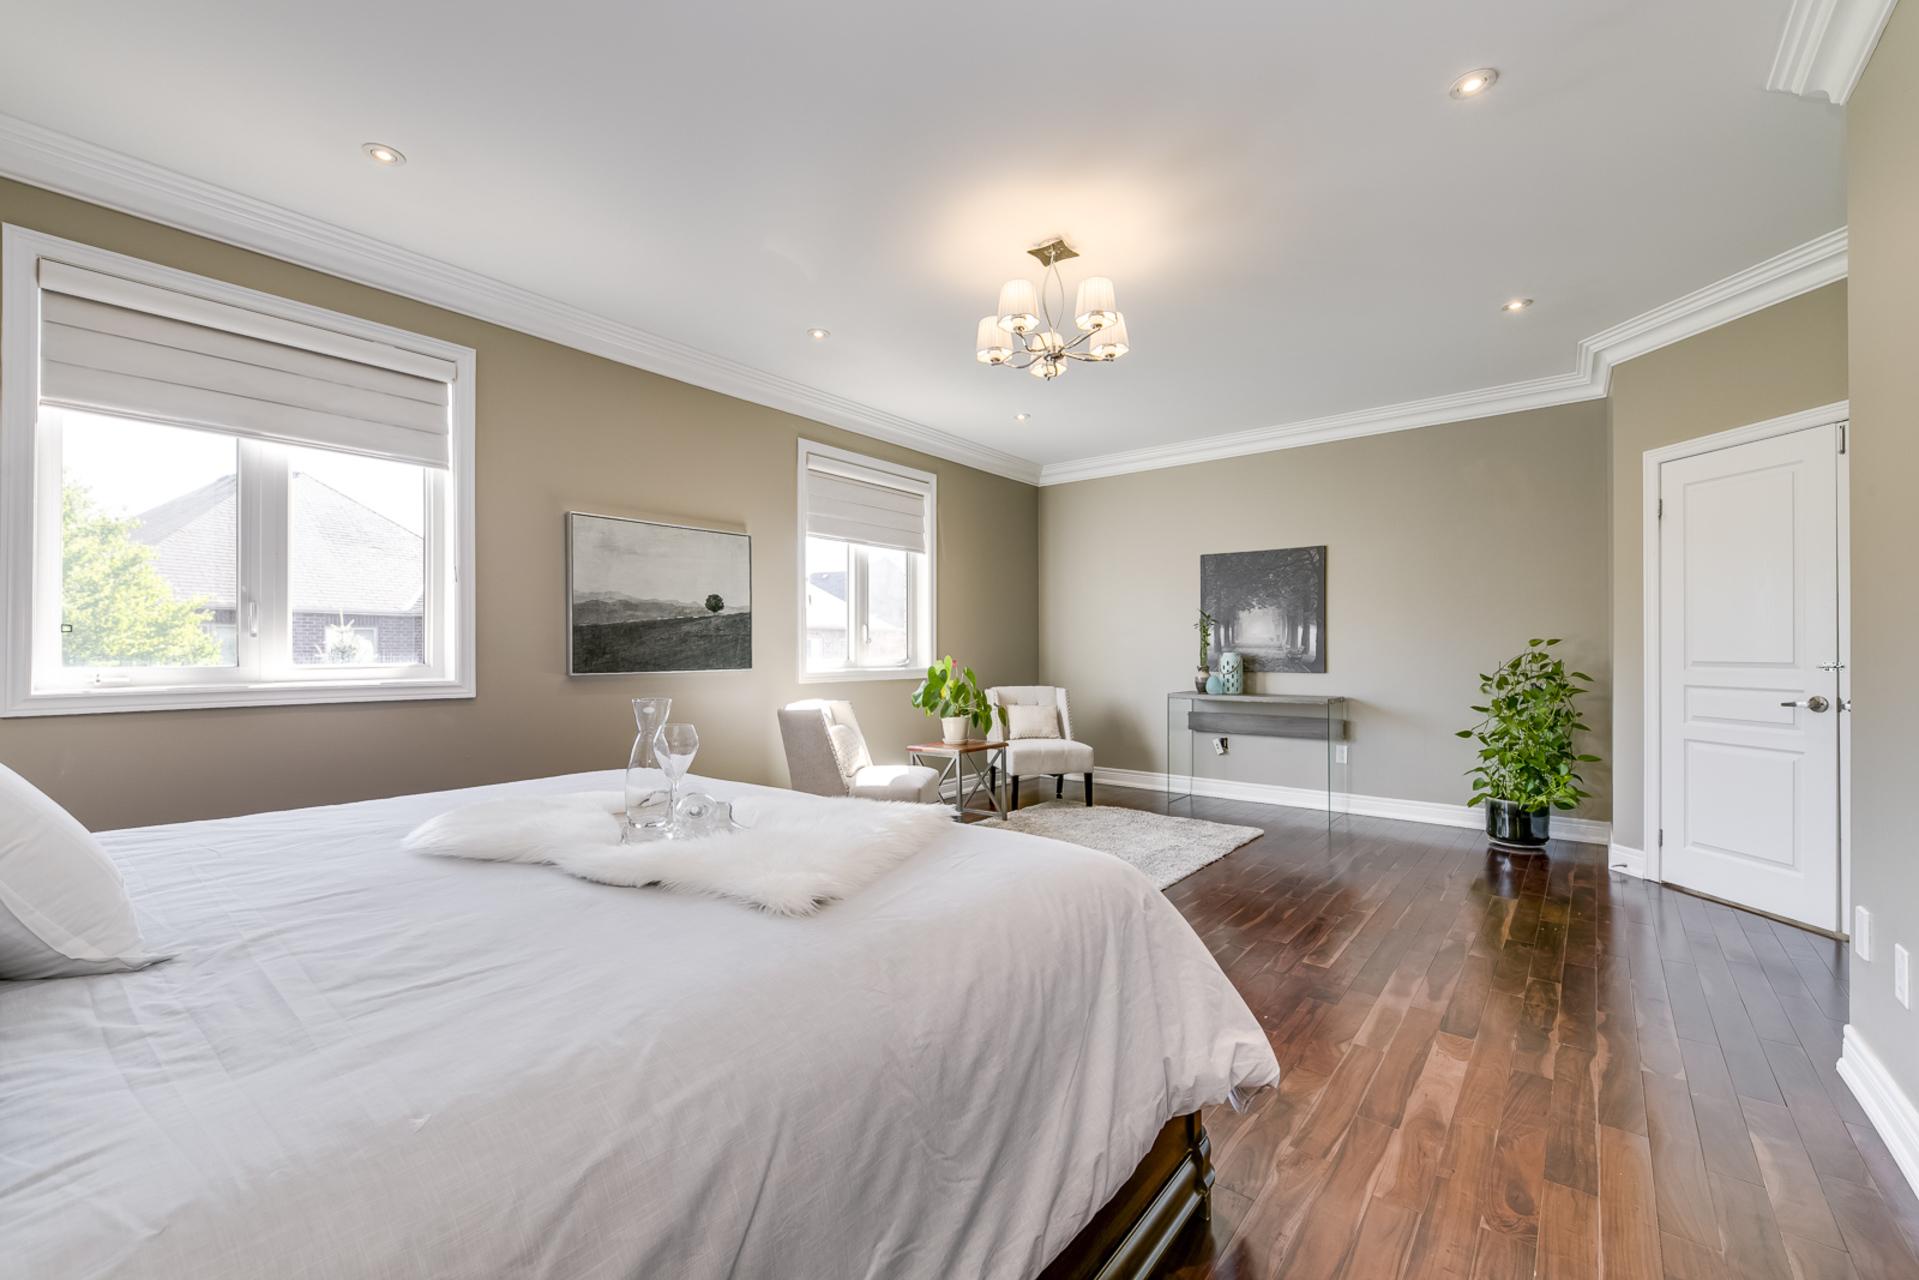 Master Bedroom - 1276 Kestell Blvd, Oakville - Elite3 & Team at 1276 Kestell Boulevard, Iroquois Ridge North, Oakville